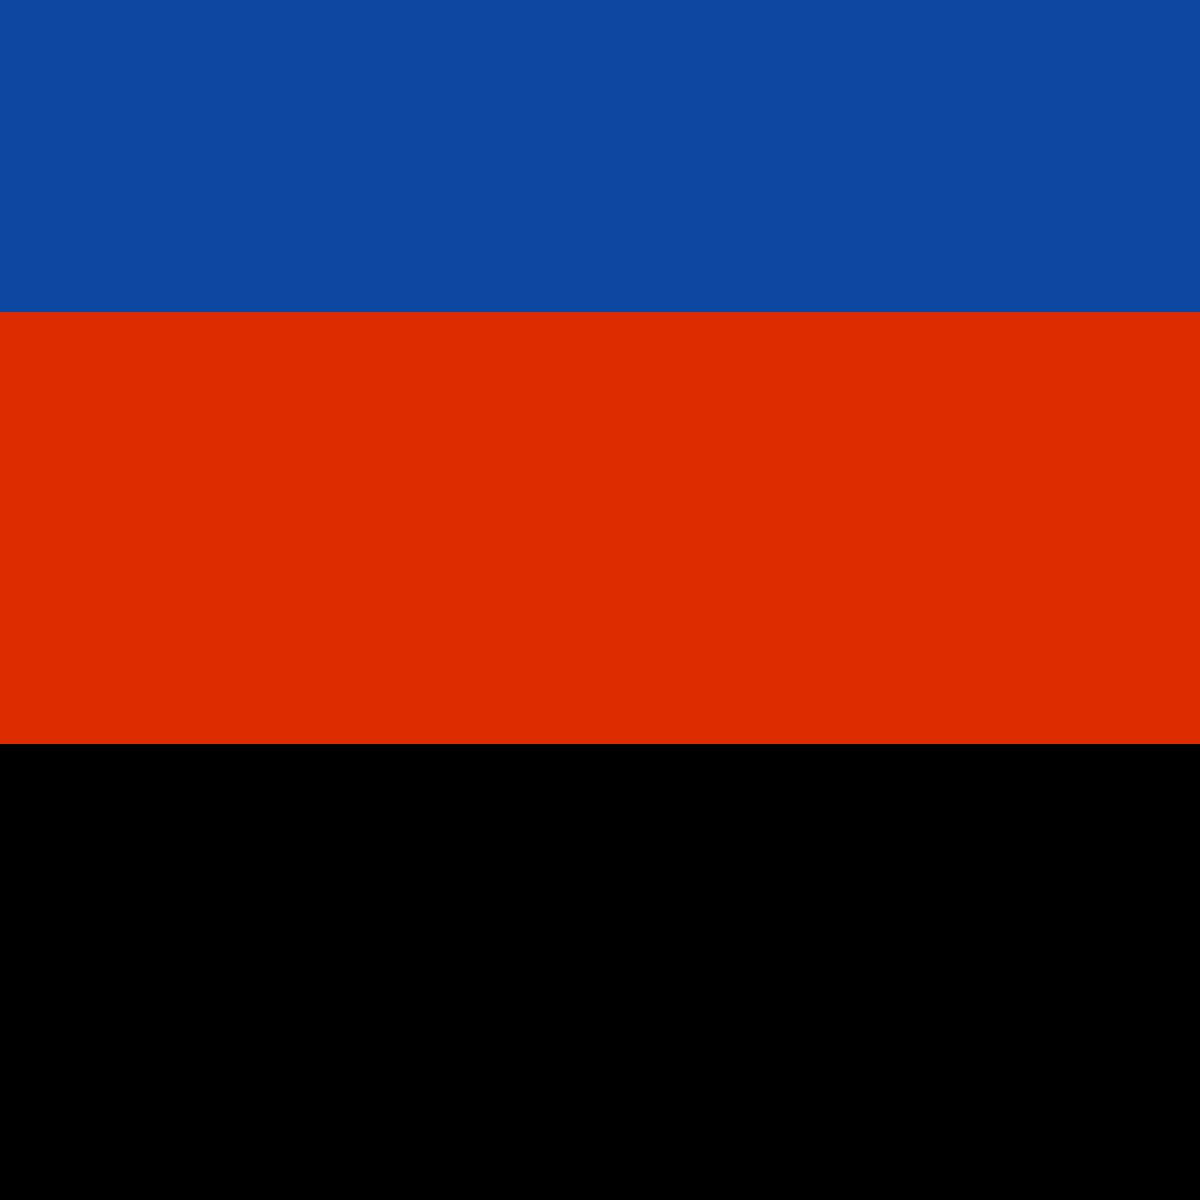 Pixilart - Polyamory flag by Sin-gle-Pan-da